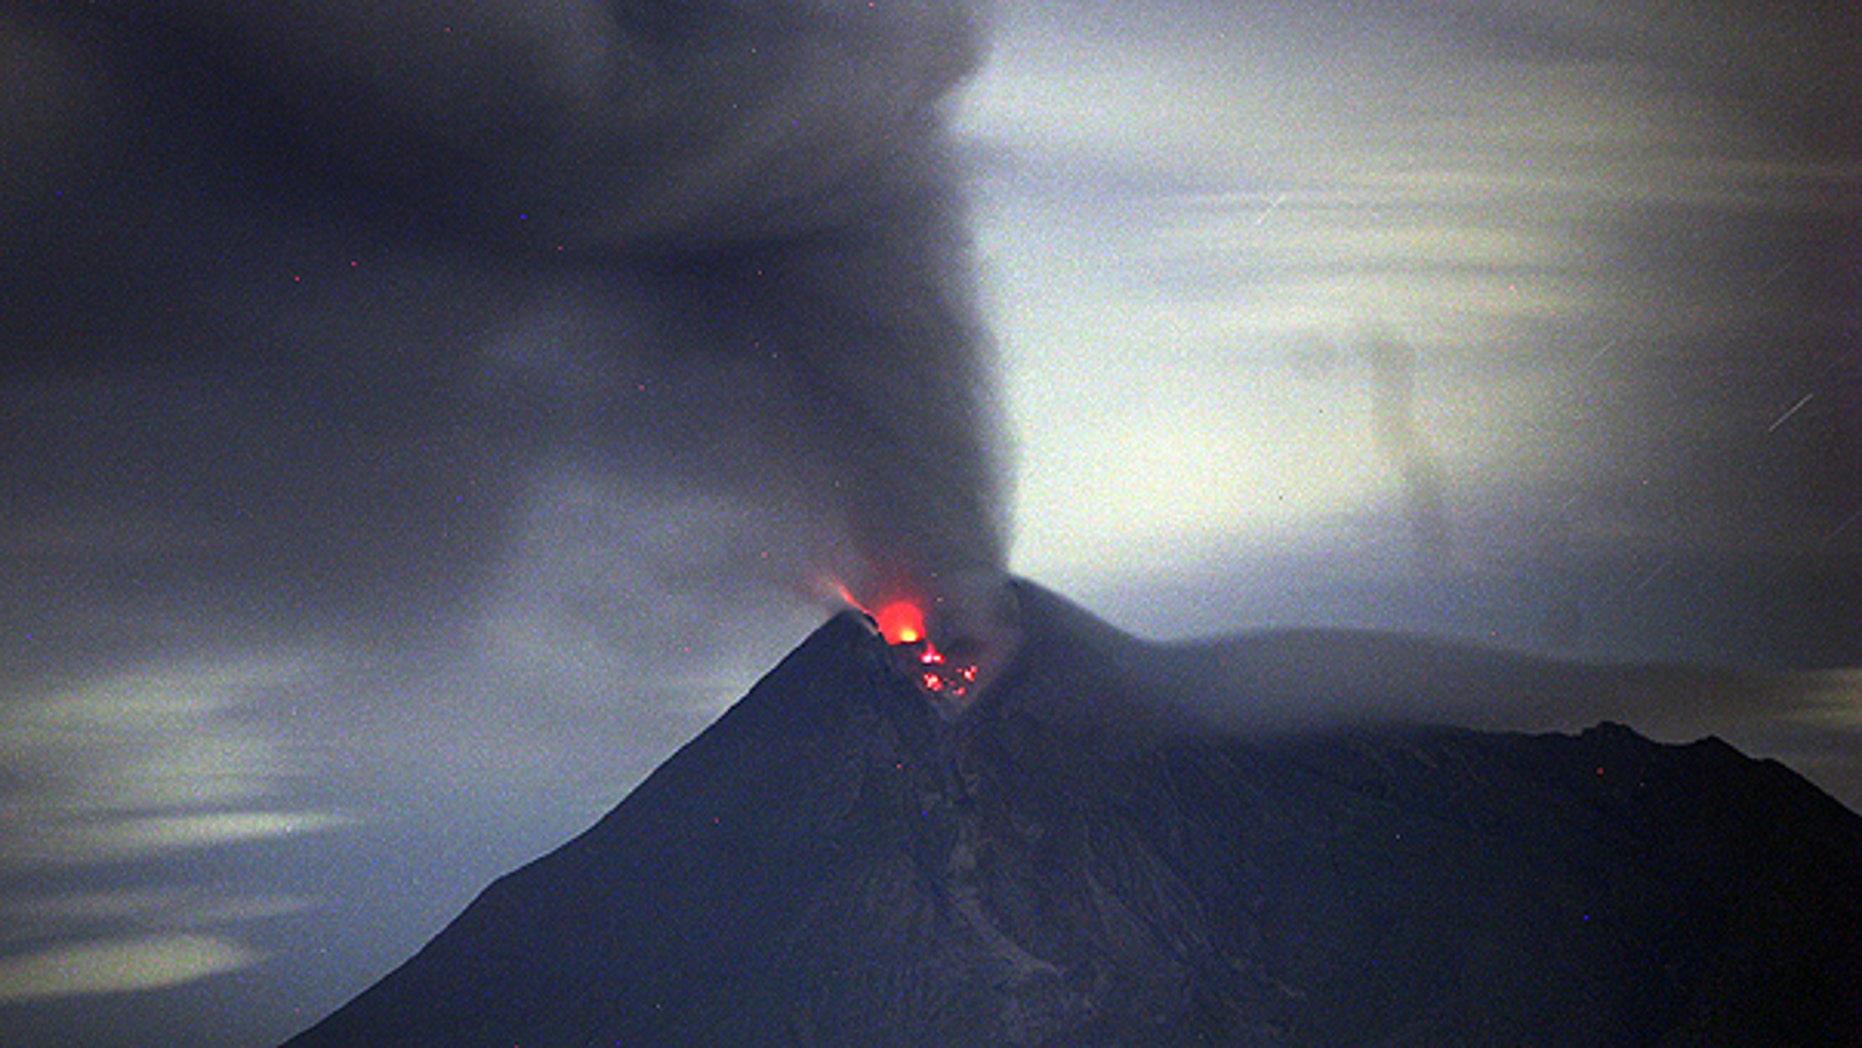 Nov. 13: Mount Merapi spews volcanic material as seen from Manis Renggo, Klaten, Indonesia.